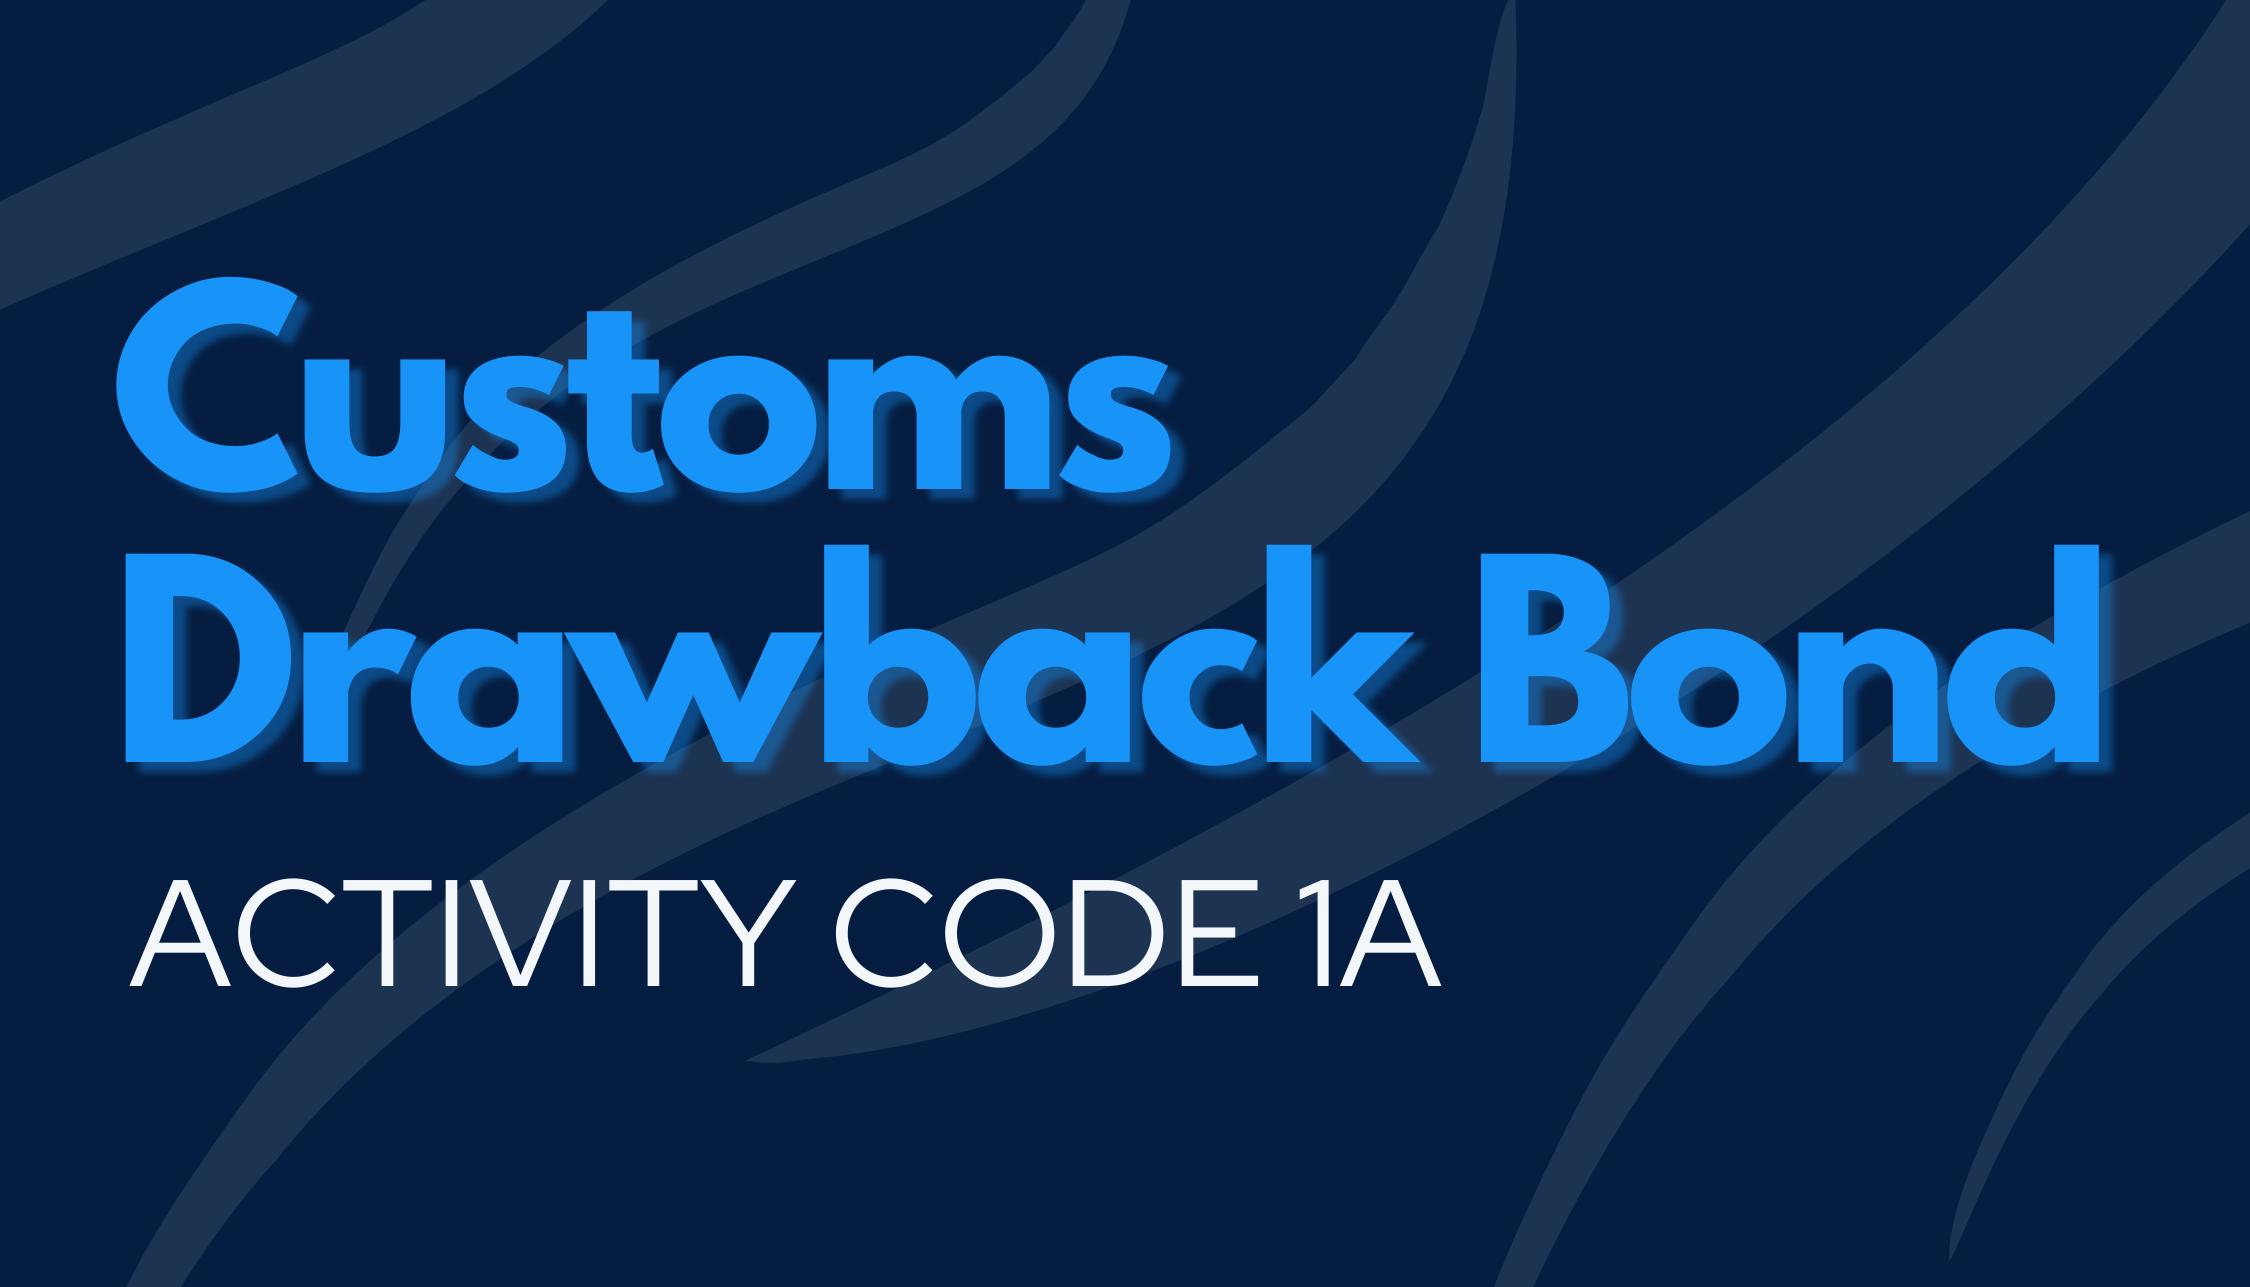 Customs Drawback Bond   Activity Code 1A